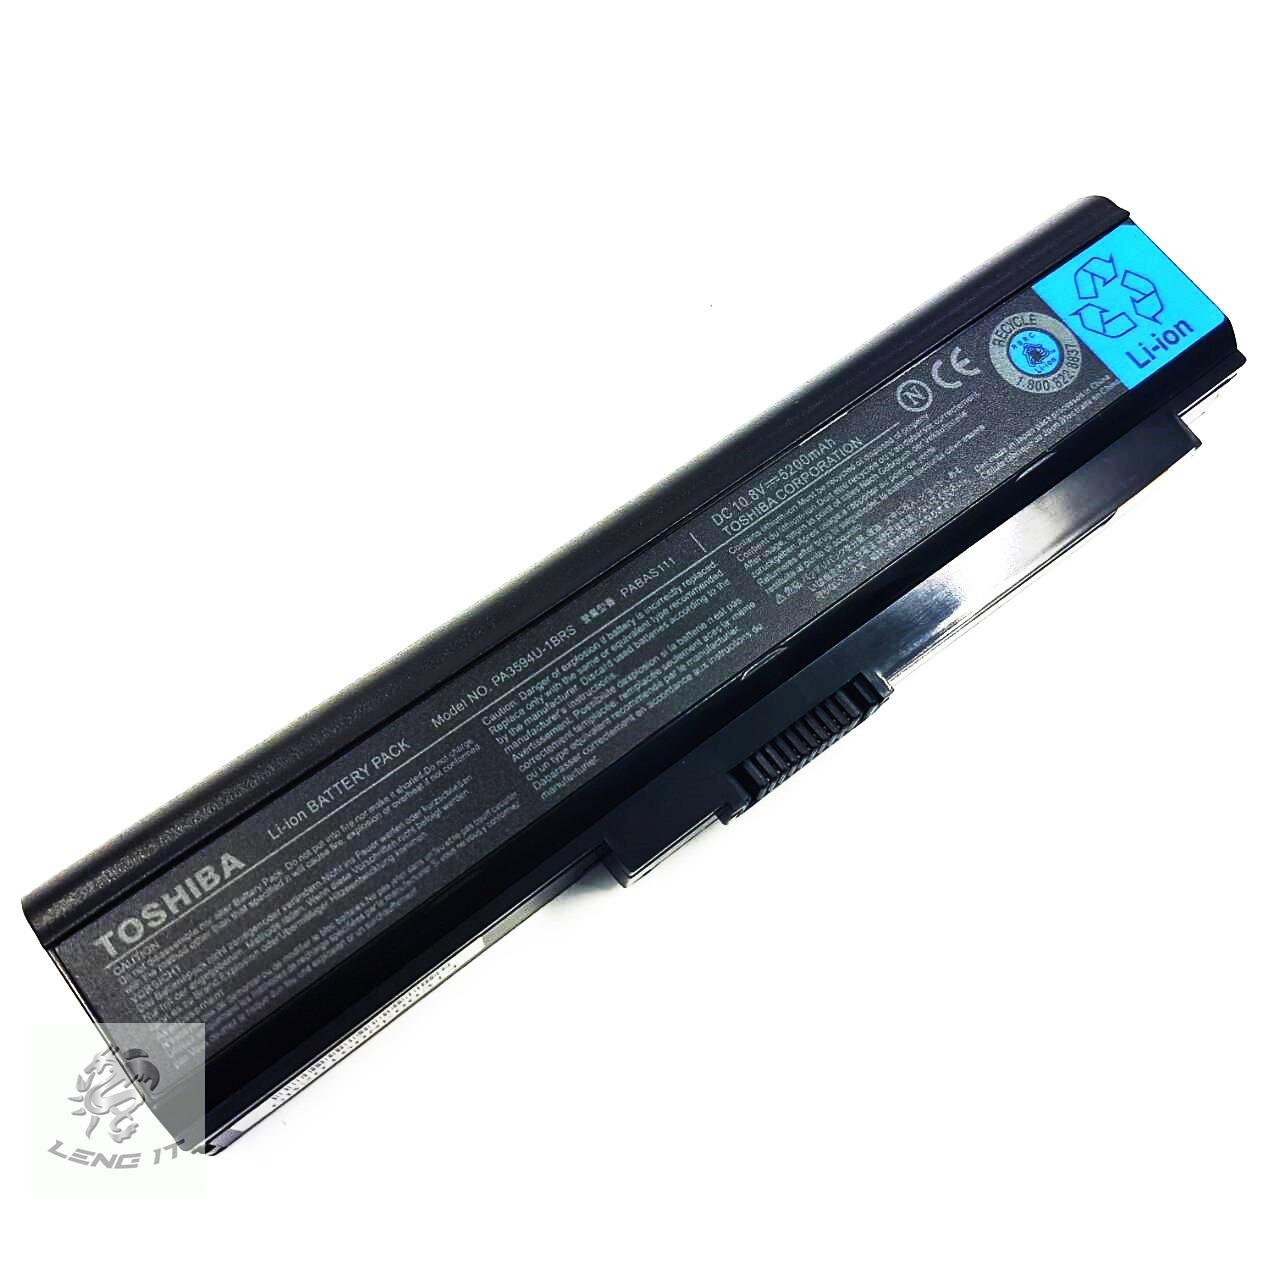 Battery for Toshiba U300